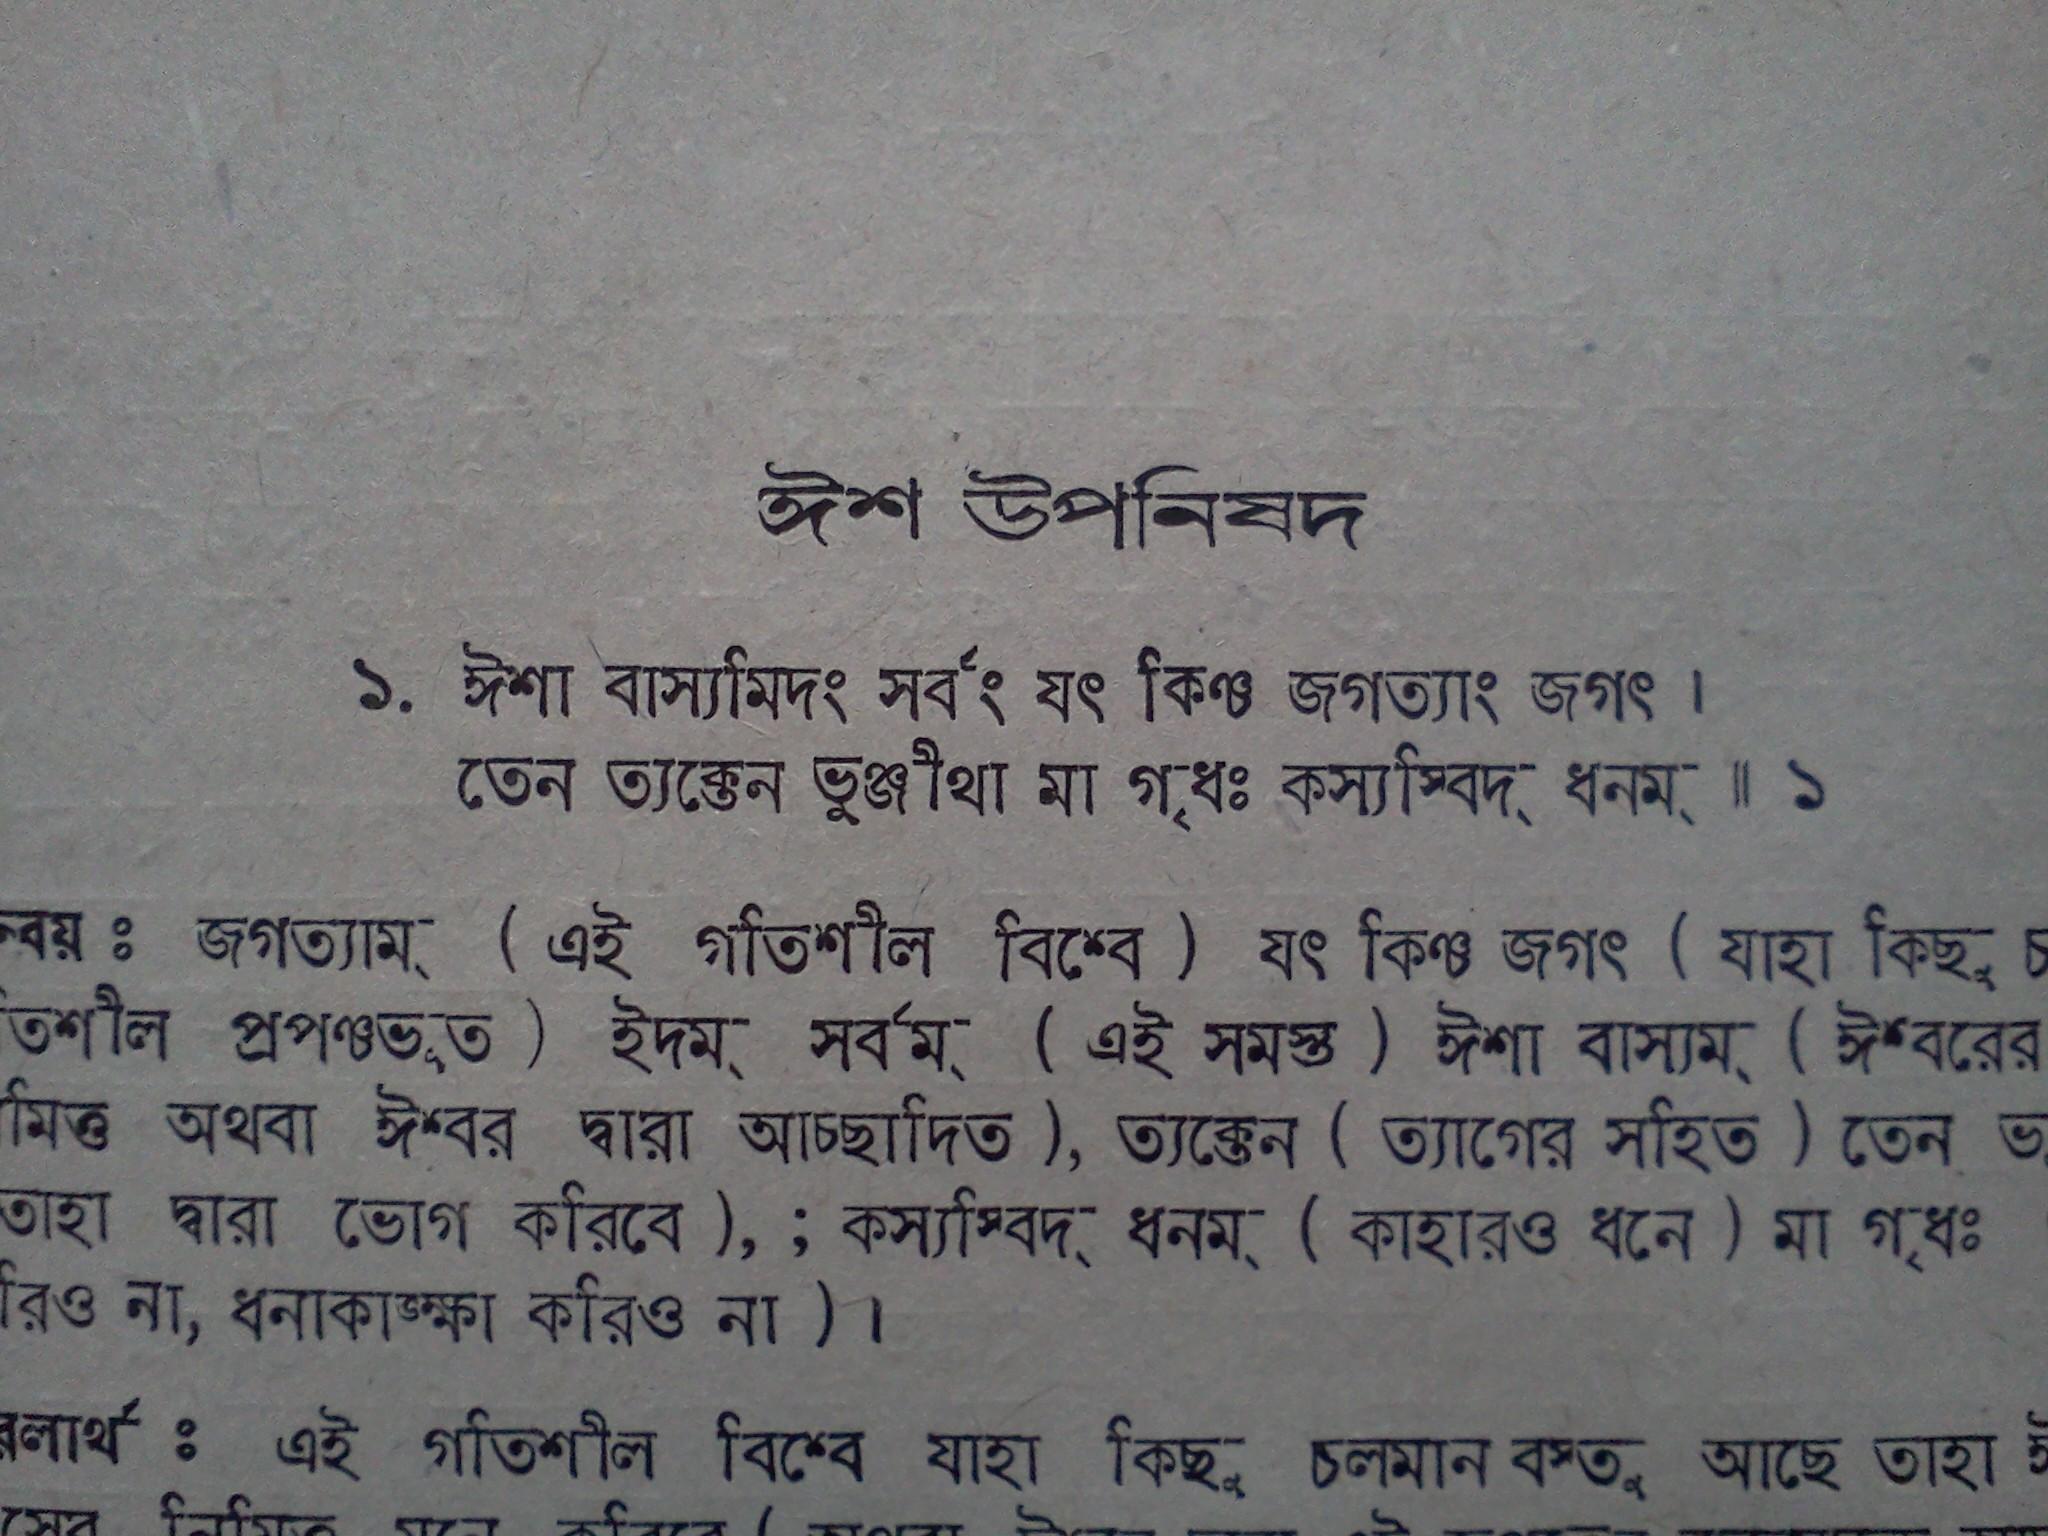 bengali-l10n | Through Myopic Eyes